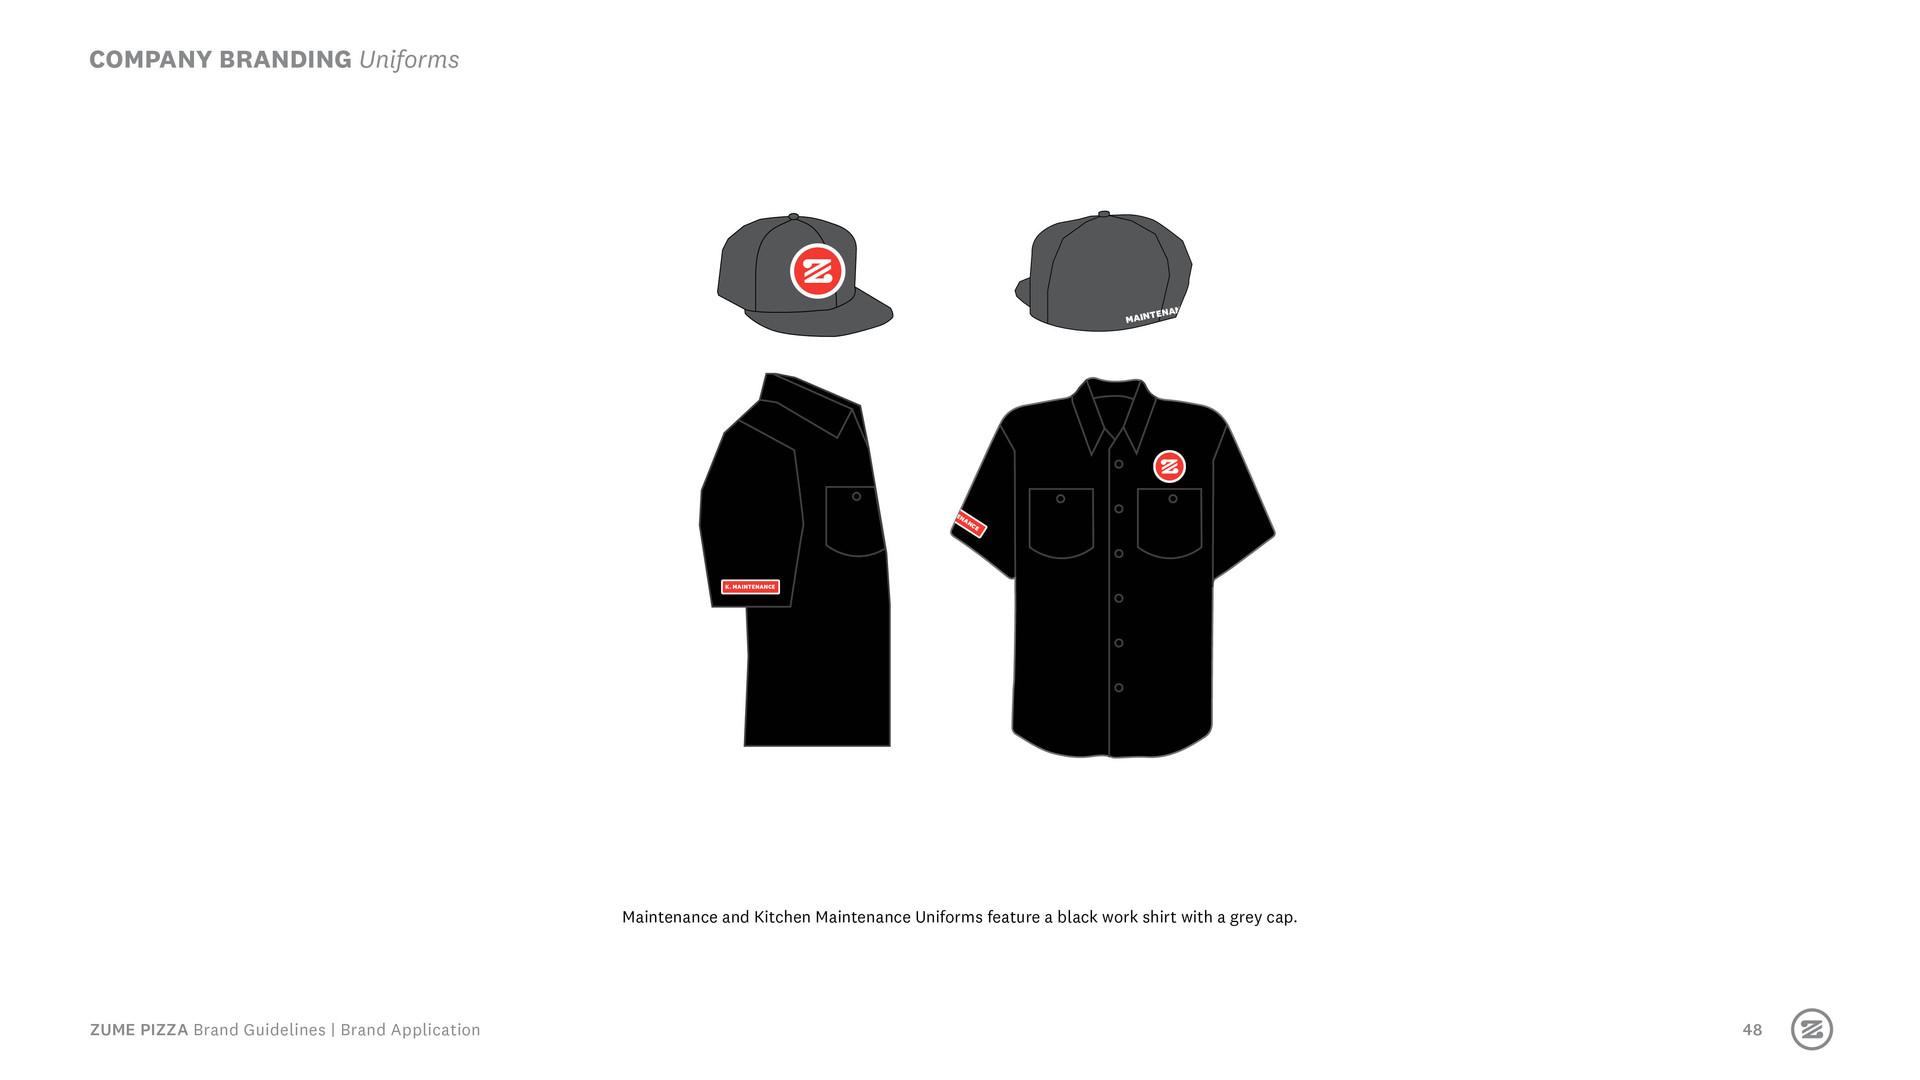 181001 Brand Guidelines48.jpg